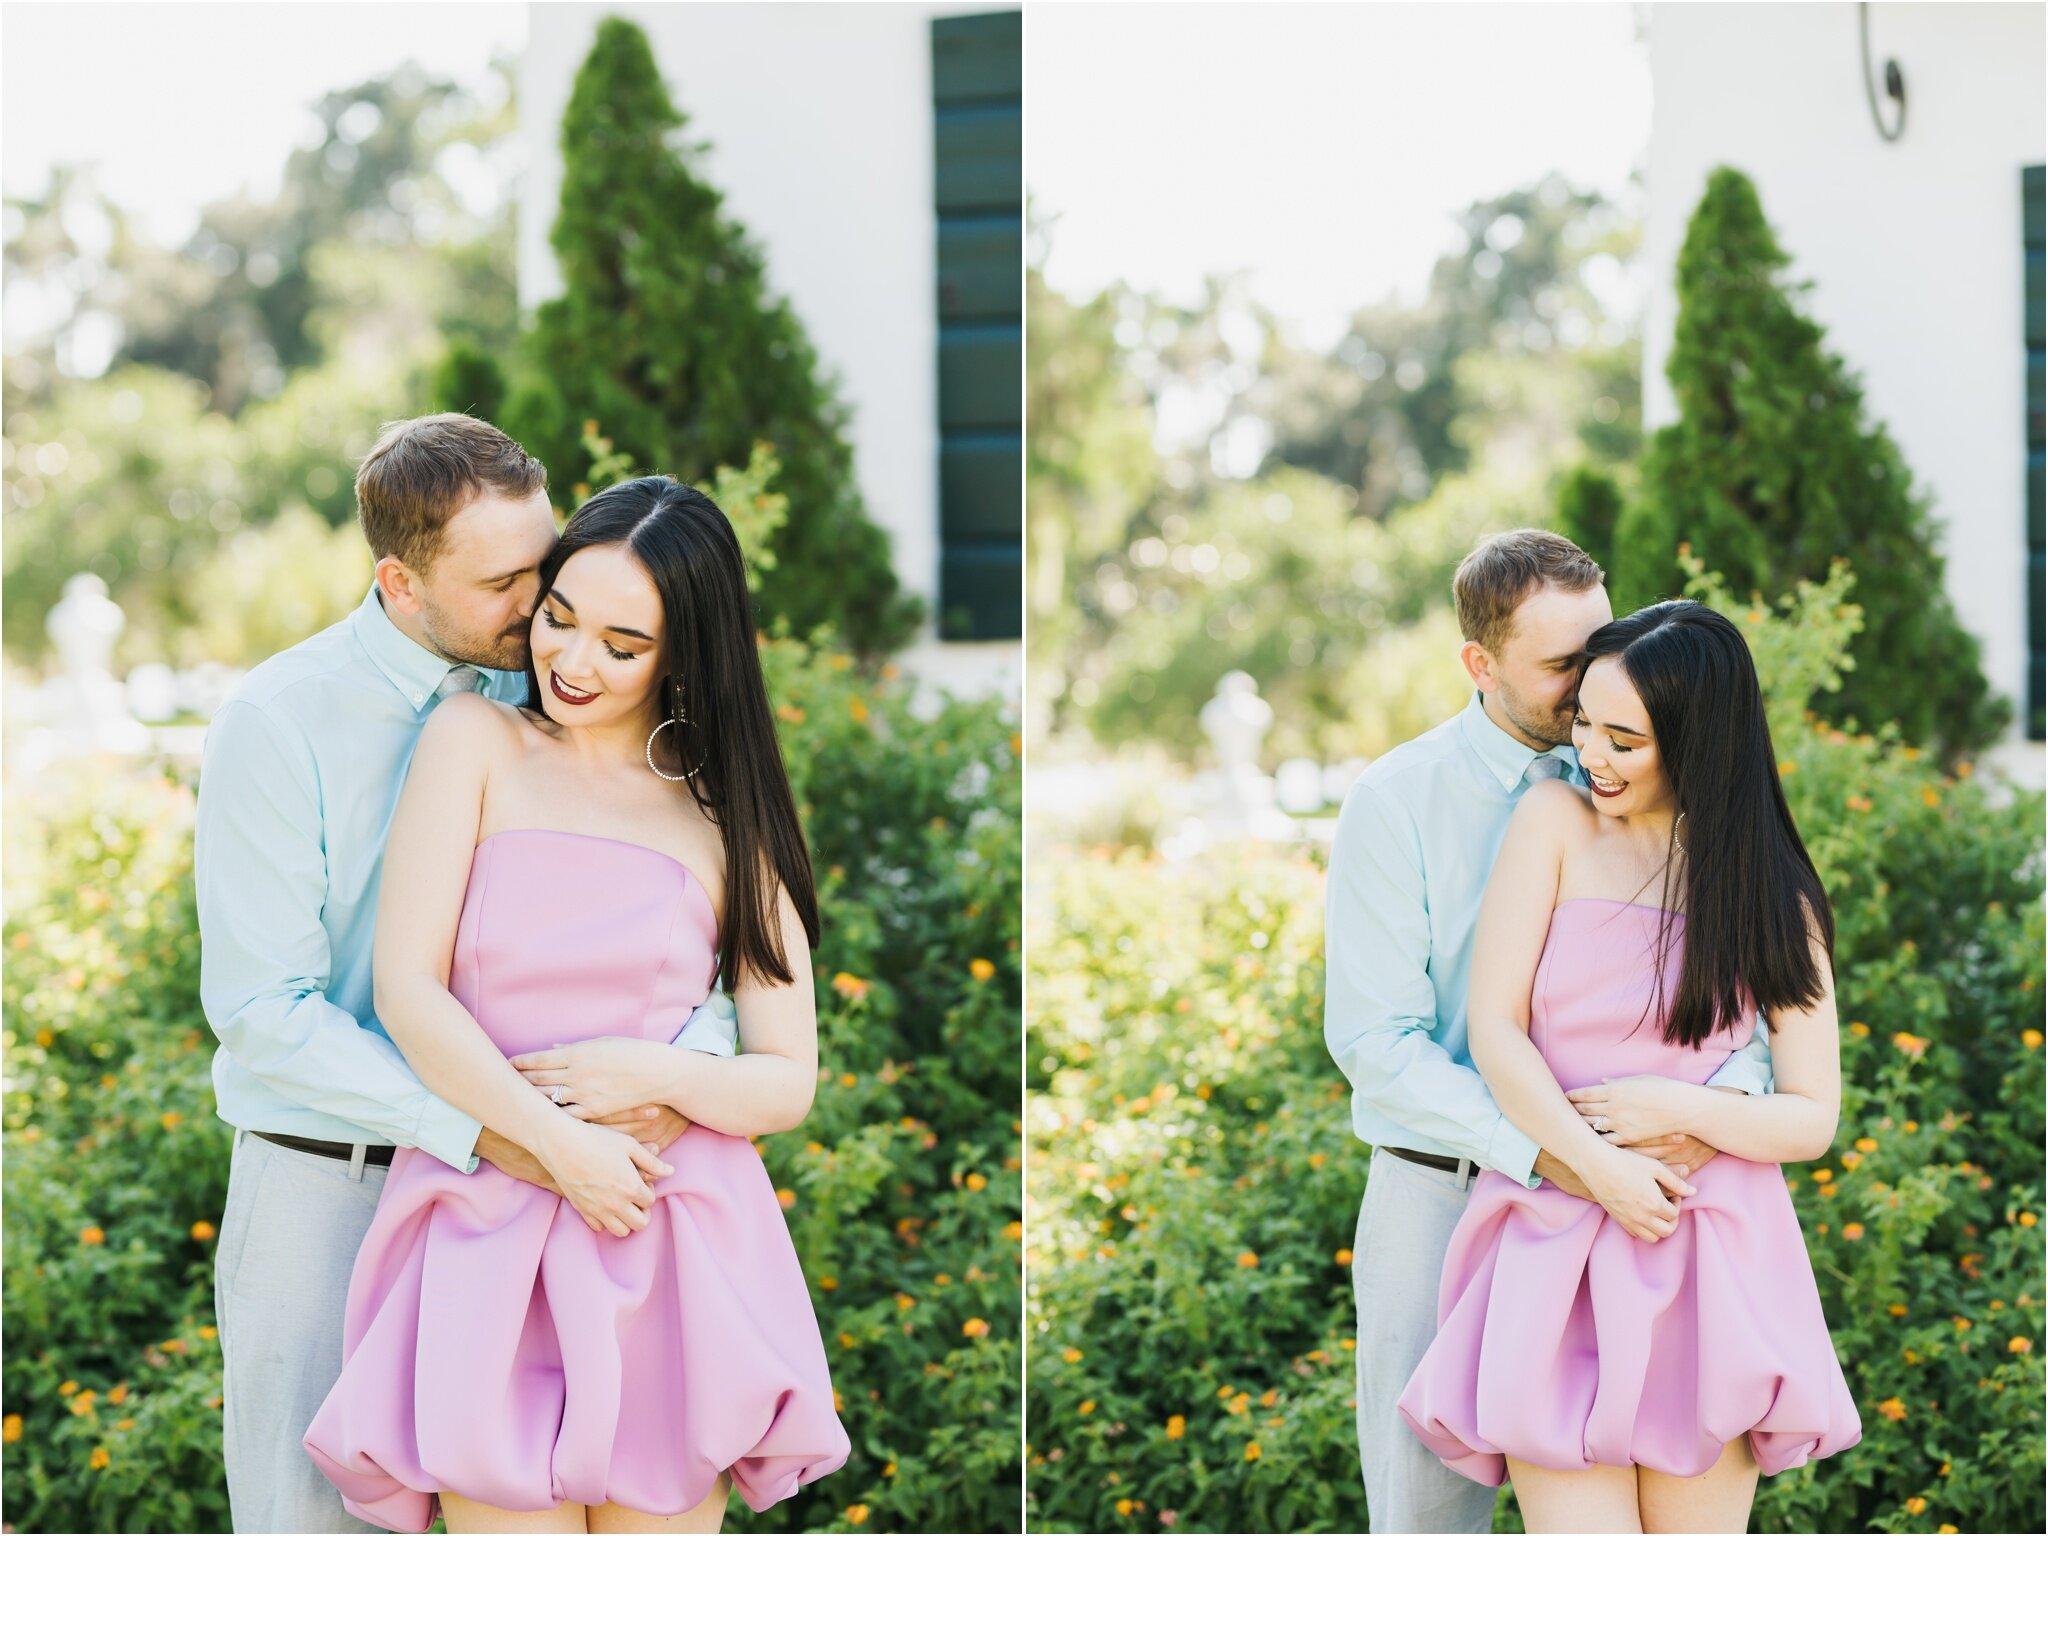 Rainey_Gregg_Photography_St._Simons_Island_Georgia_California_Wedding_Portrait_Photography_1819.jpg